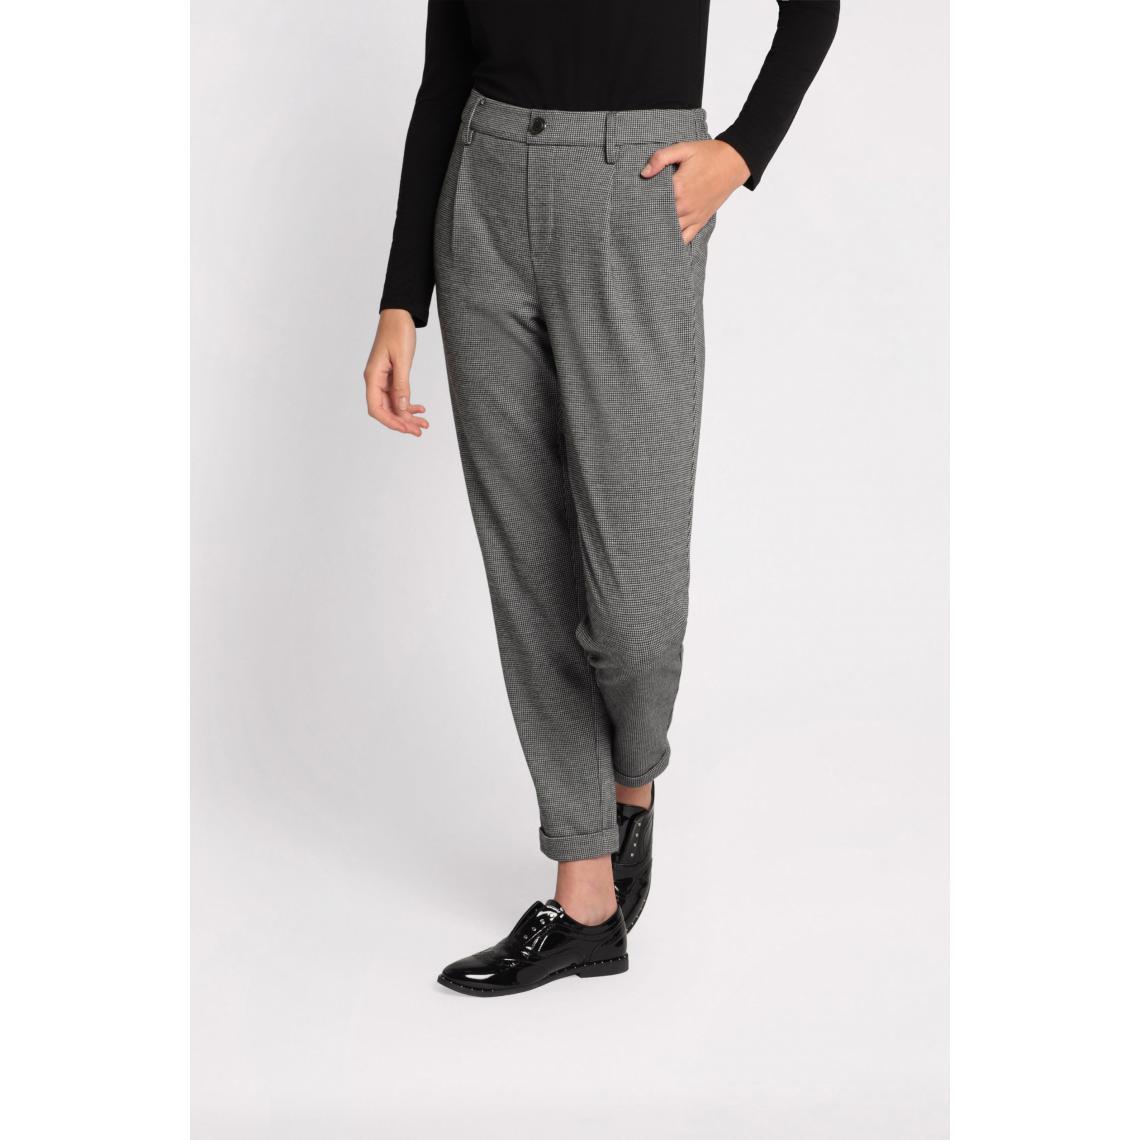 Pantalon chino slim à ourlets - Cache cache - Modalova